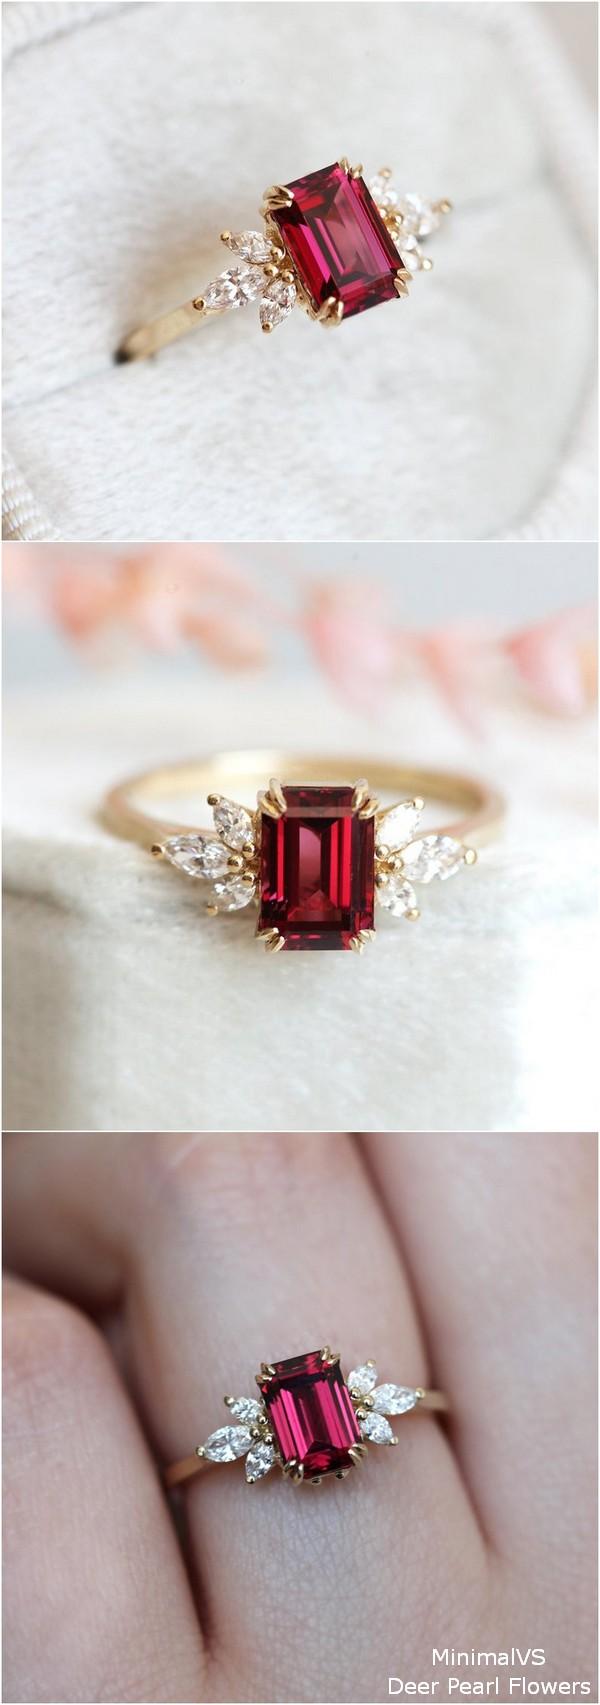 Diamond Garnet engagement ring